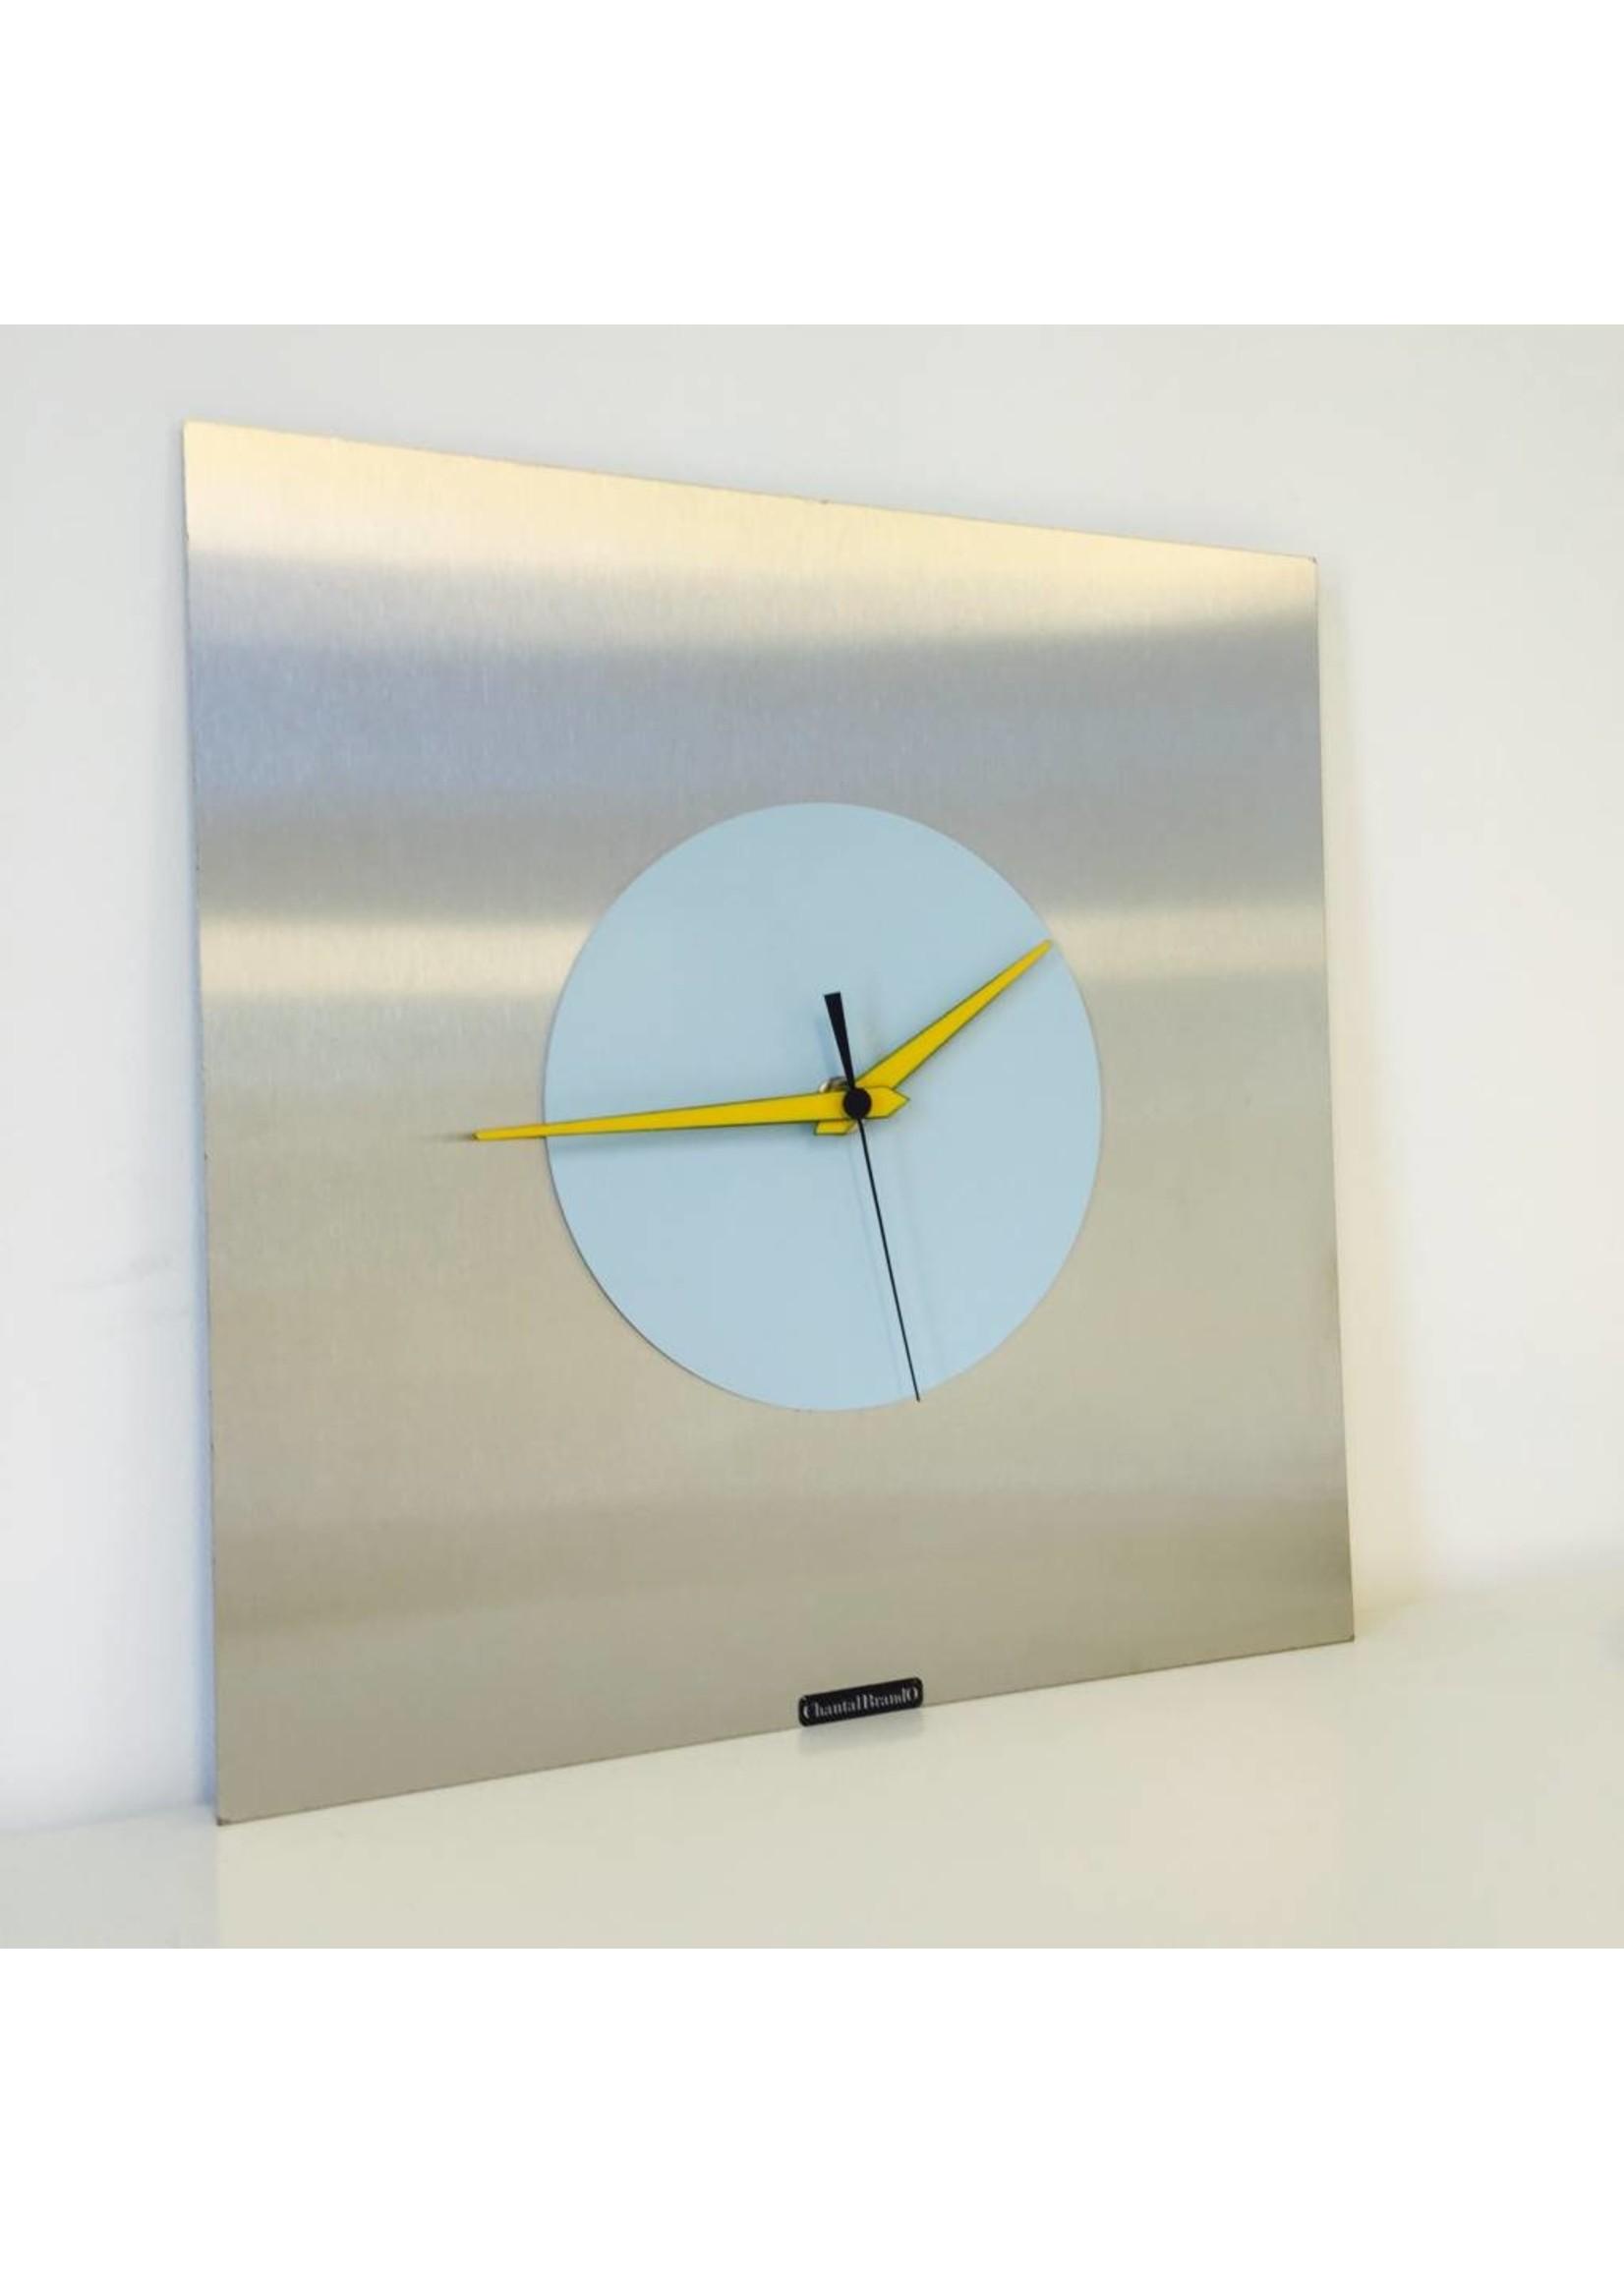 Klokkendiscounter Wandklok RVS Blue & Yellow Modern Design